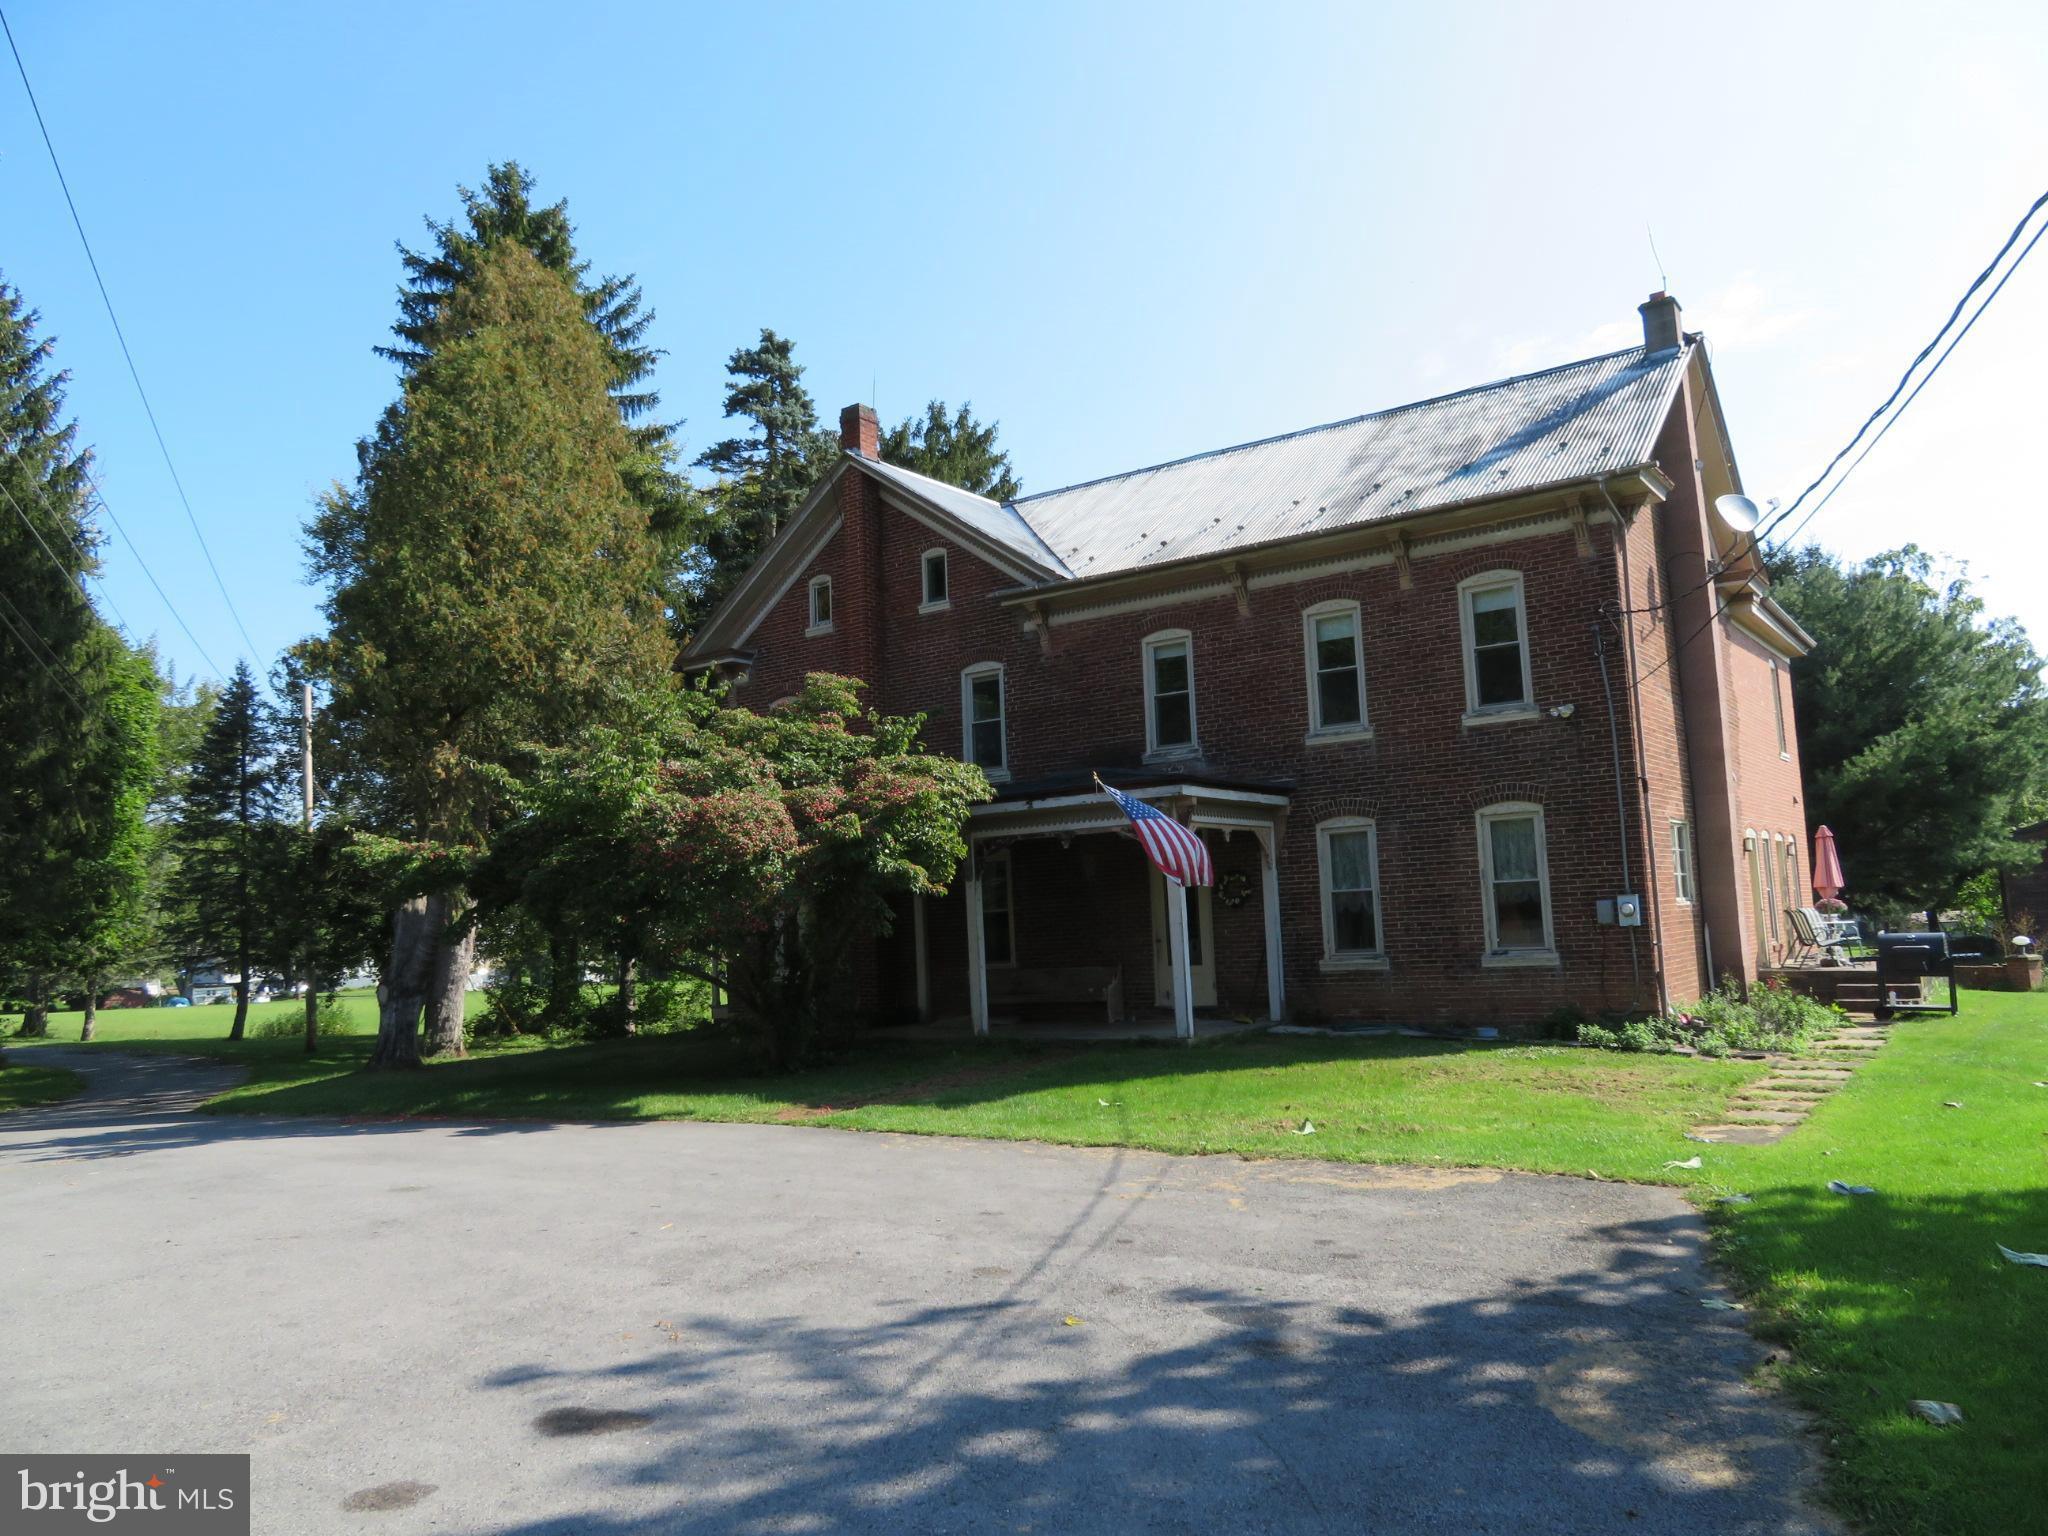 155 BOSSERT BOULEVARD, WEST MILTON, PA 17886